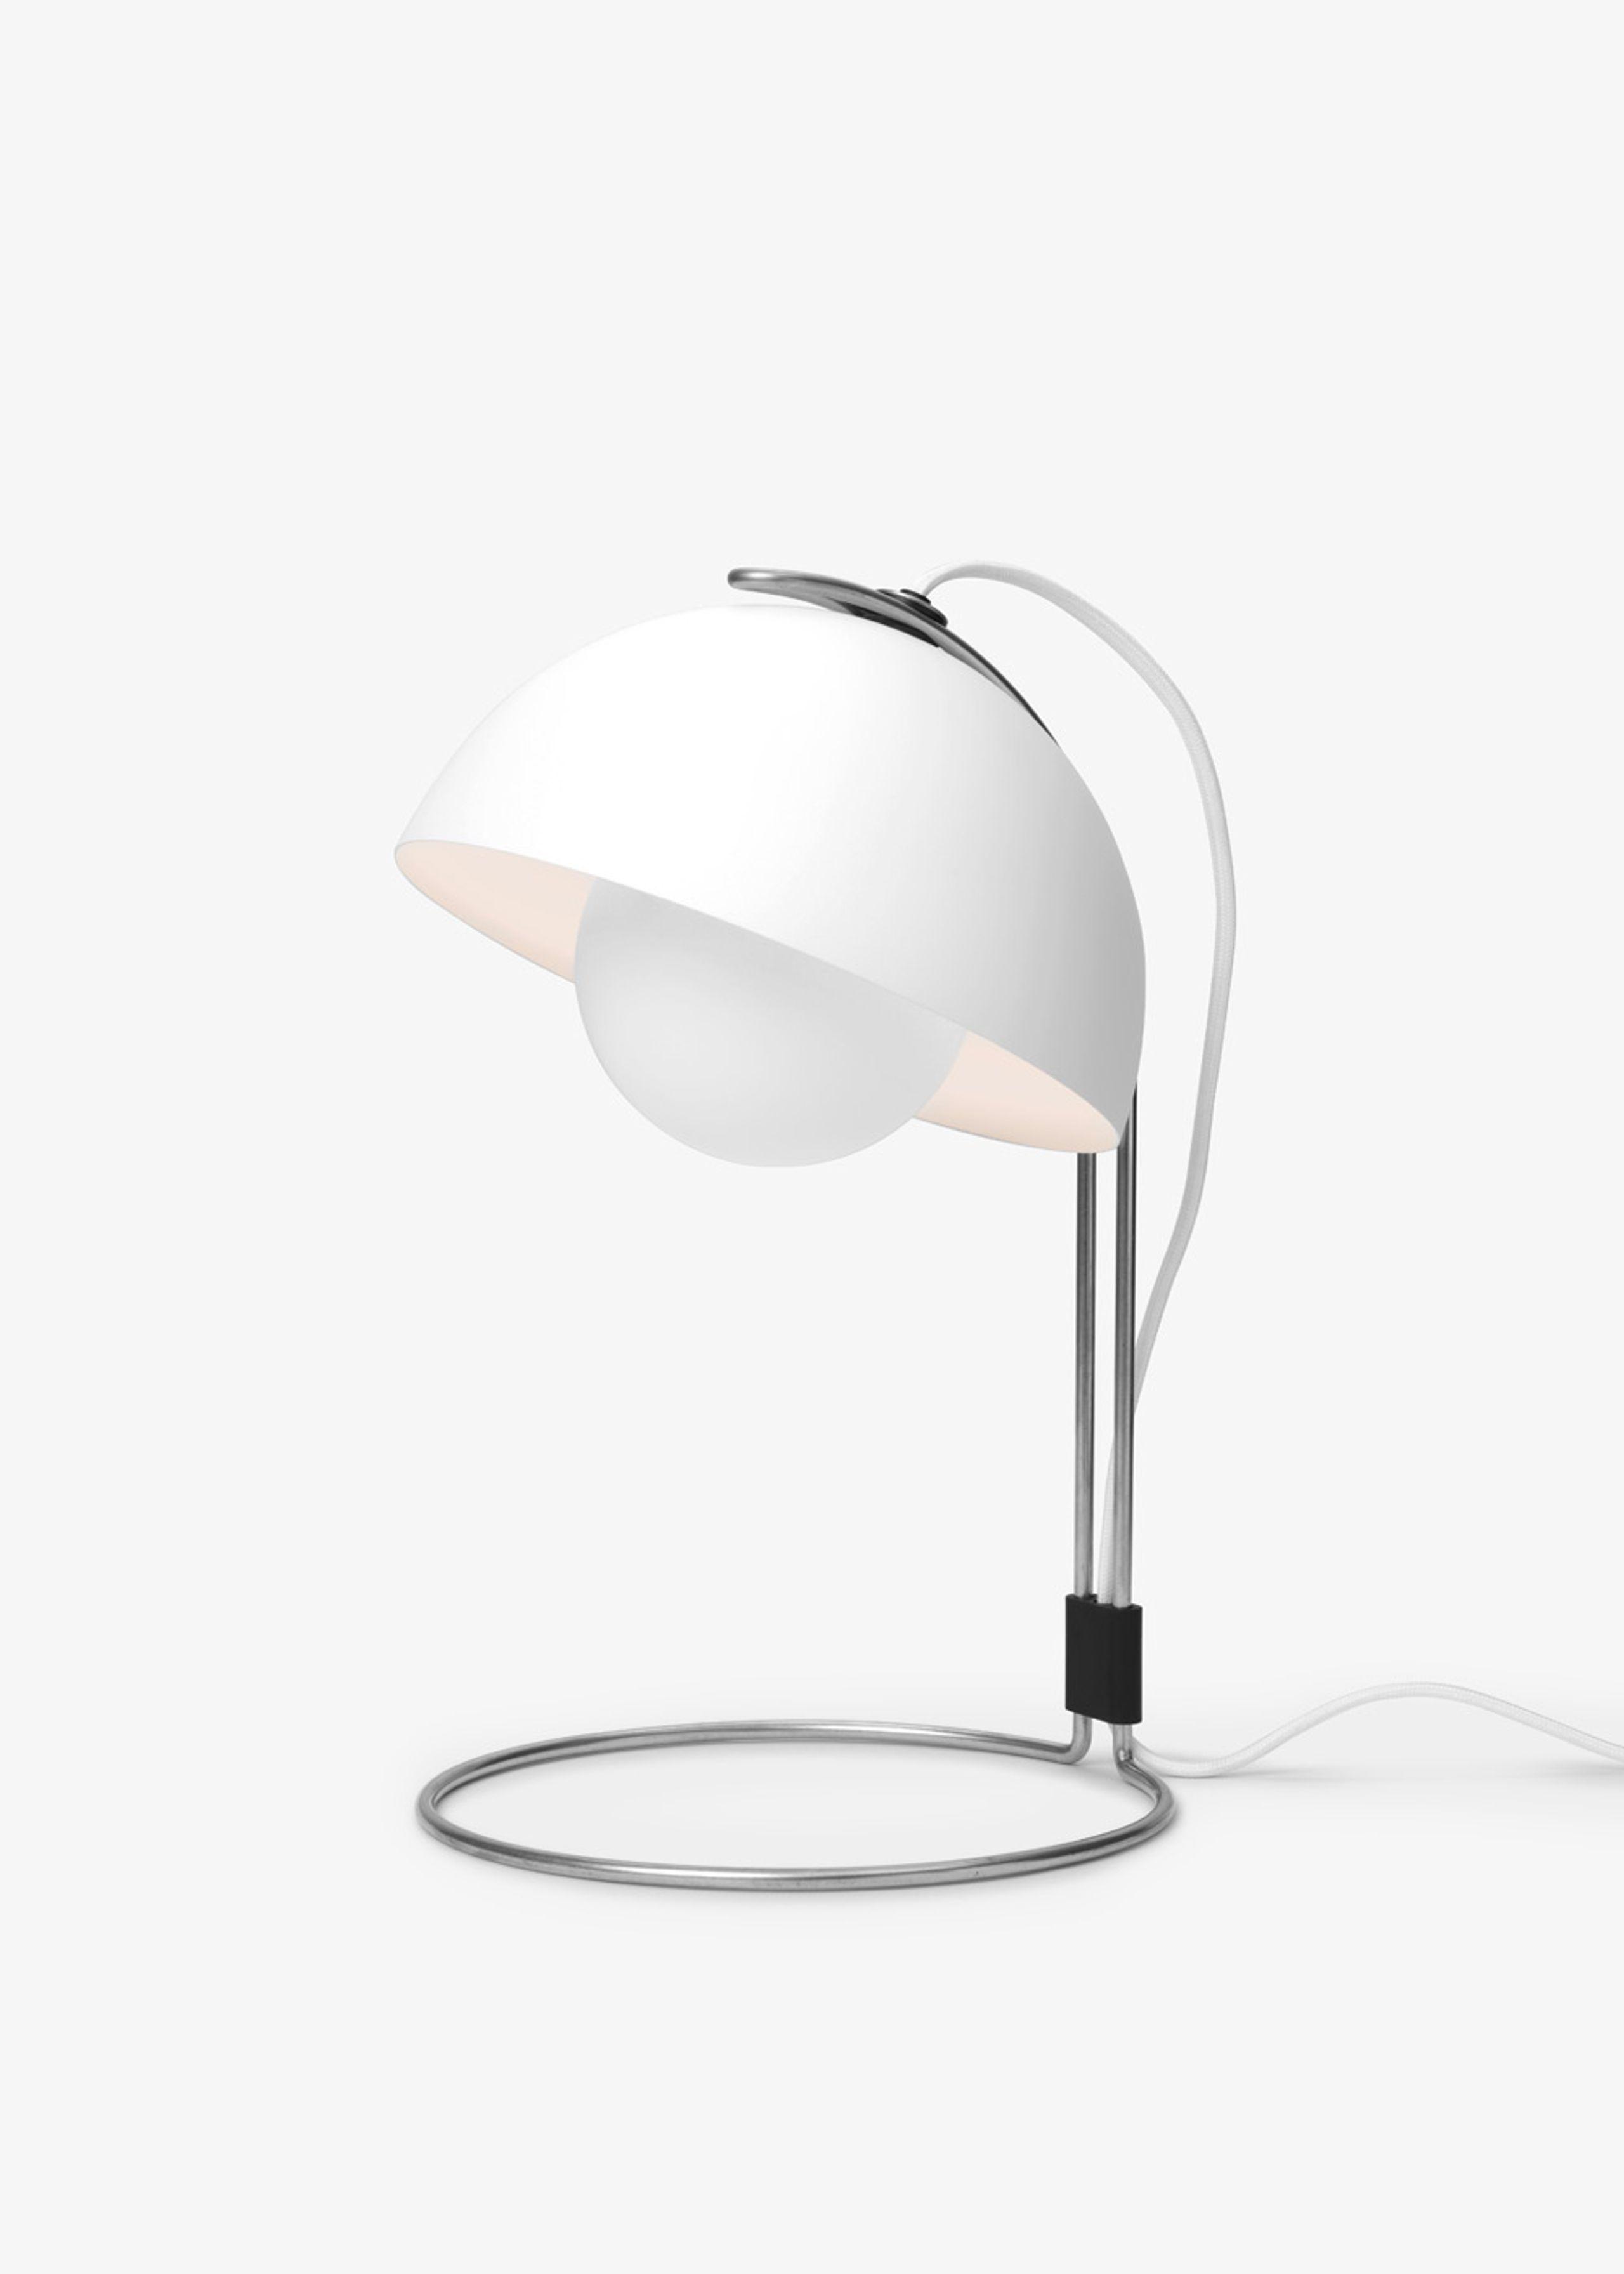 Image of   Flowerpot table lamp - VP4 af Verner Panton